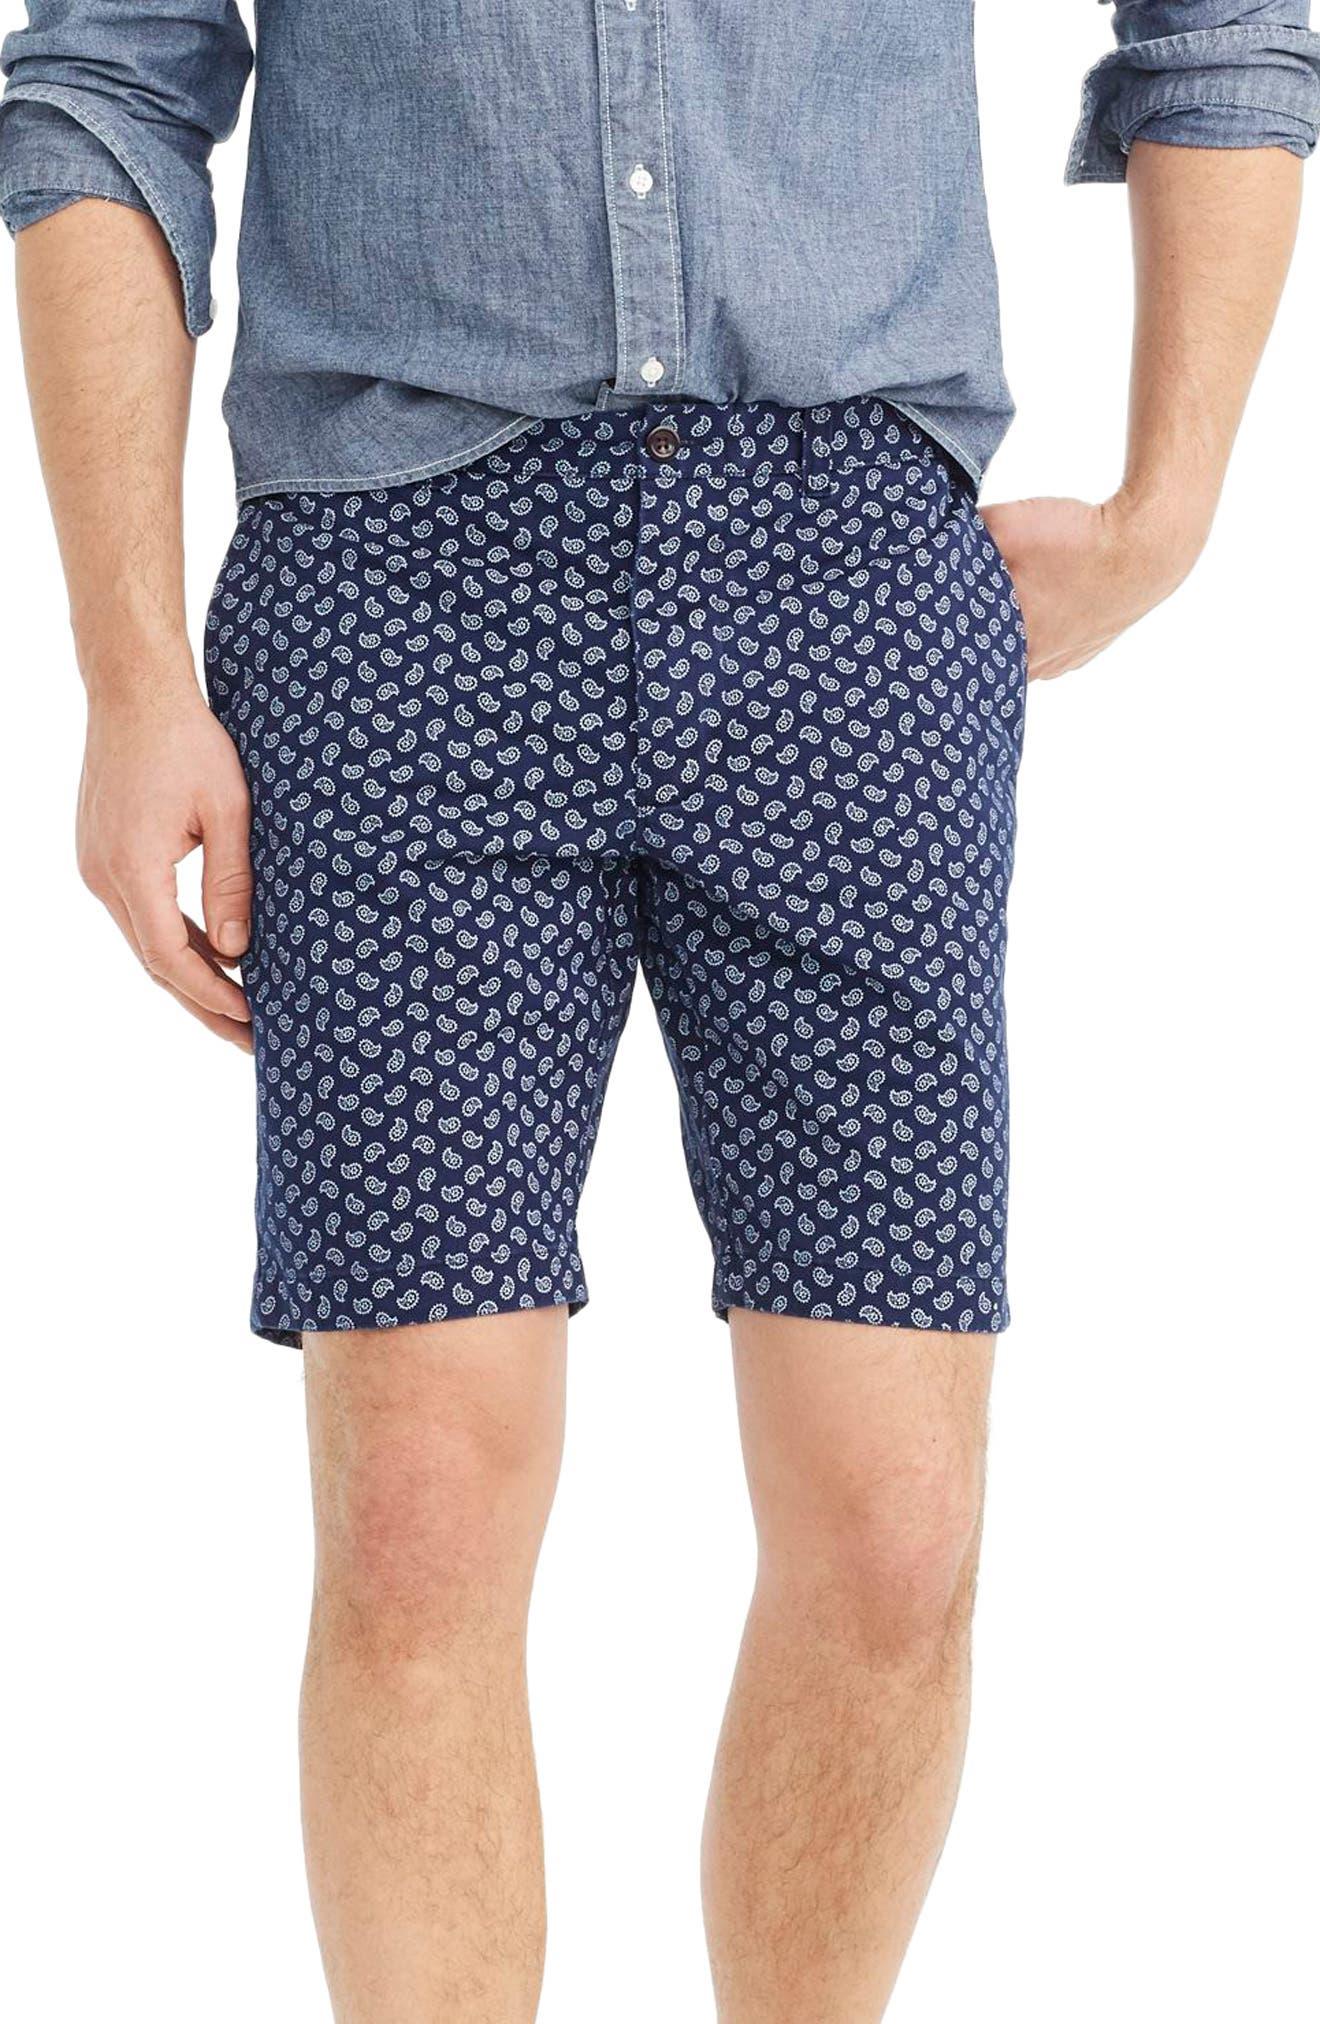 J.Crew Paisley Stretch Cotton Shorts